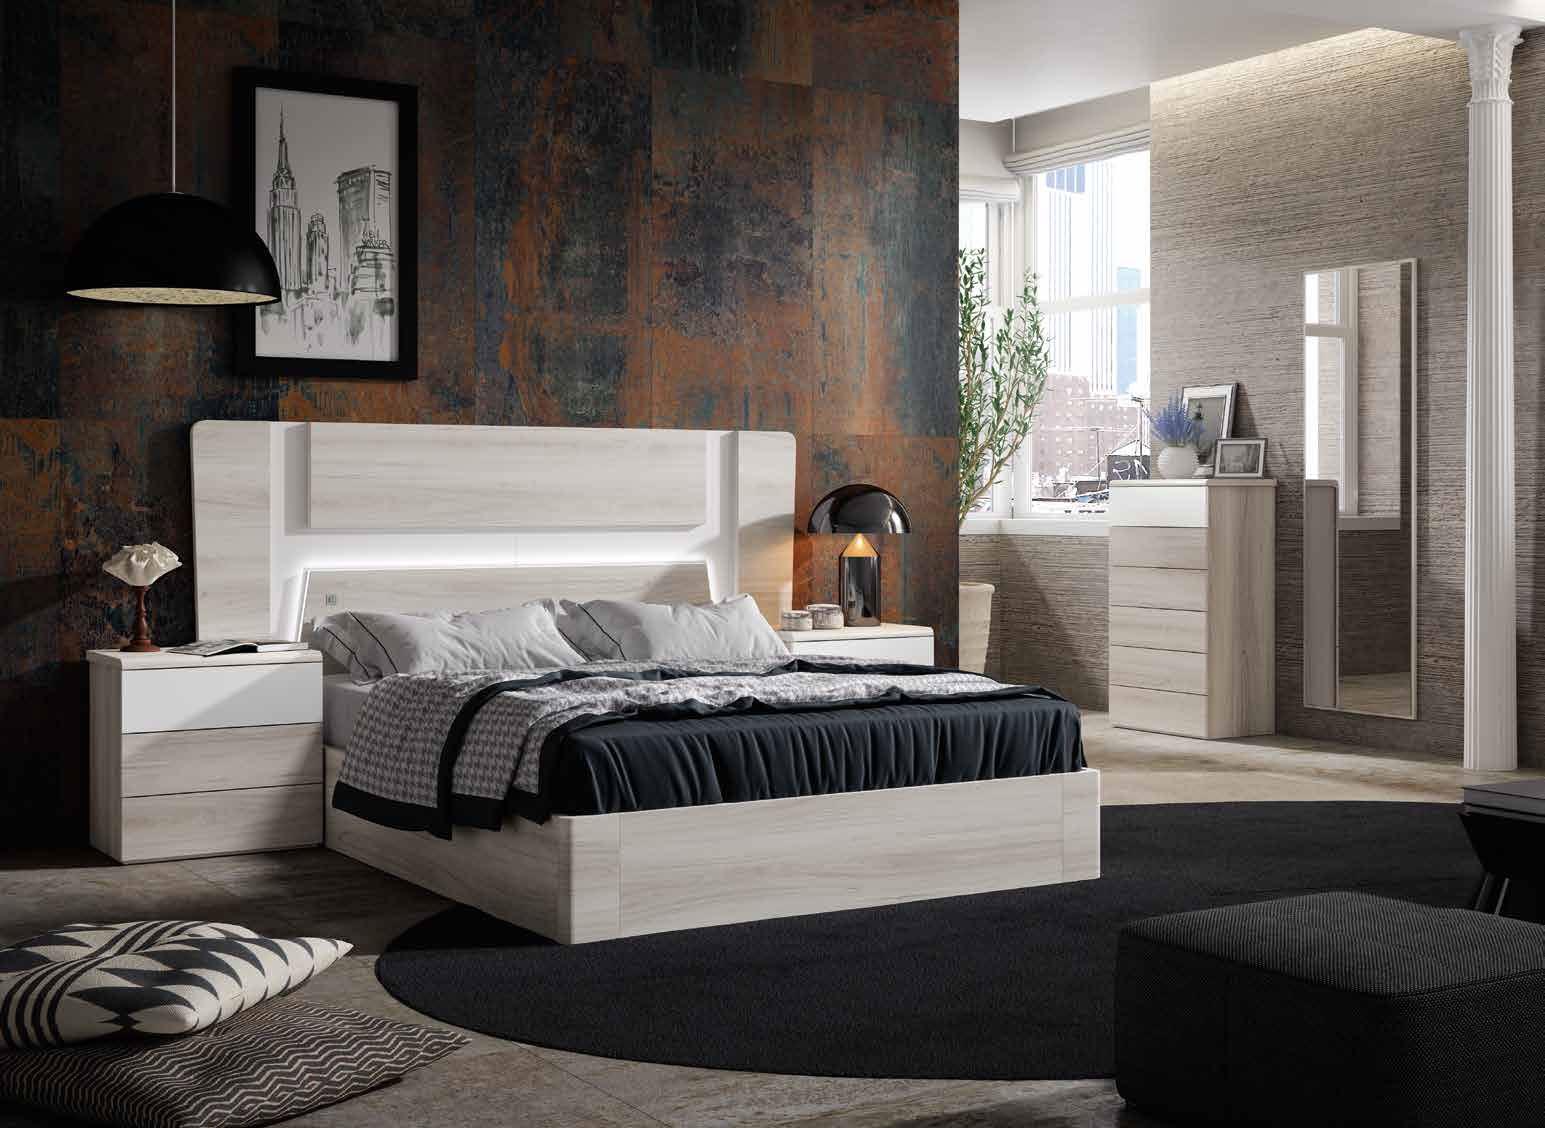 creta-dormitorio-regio-14